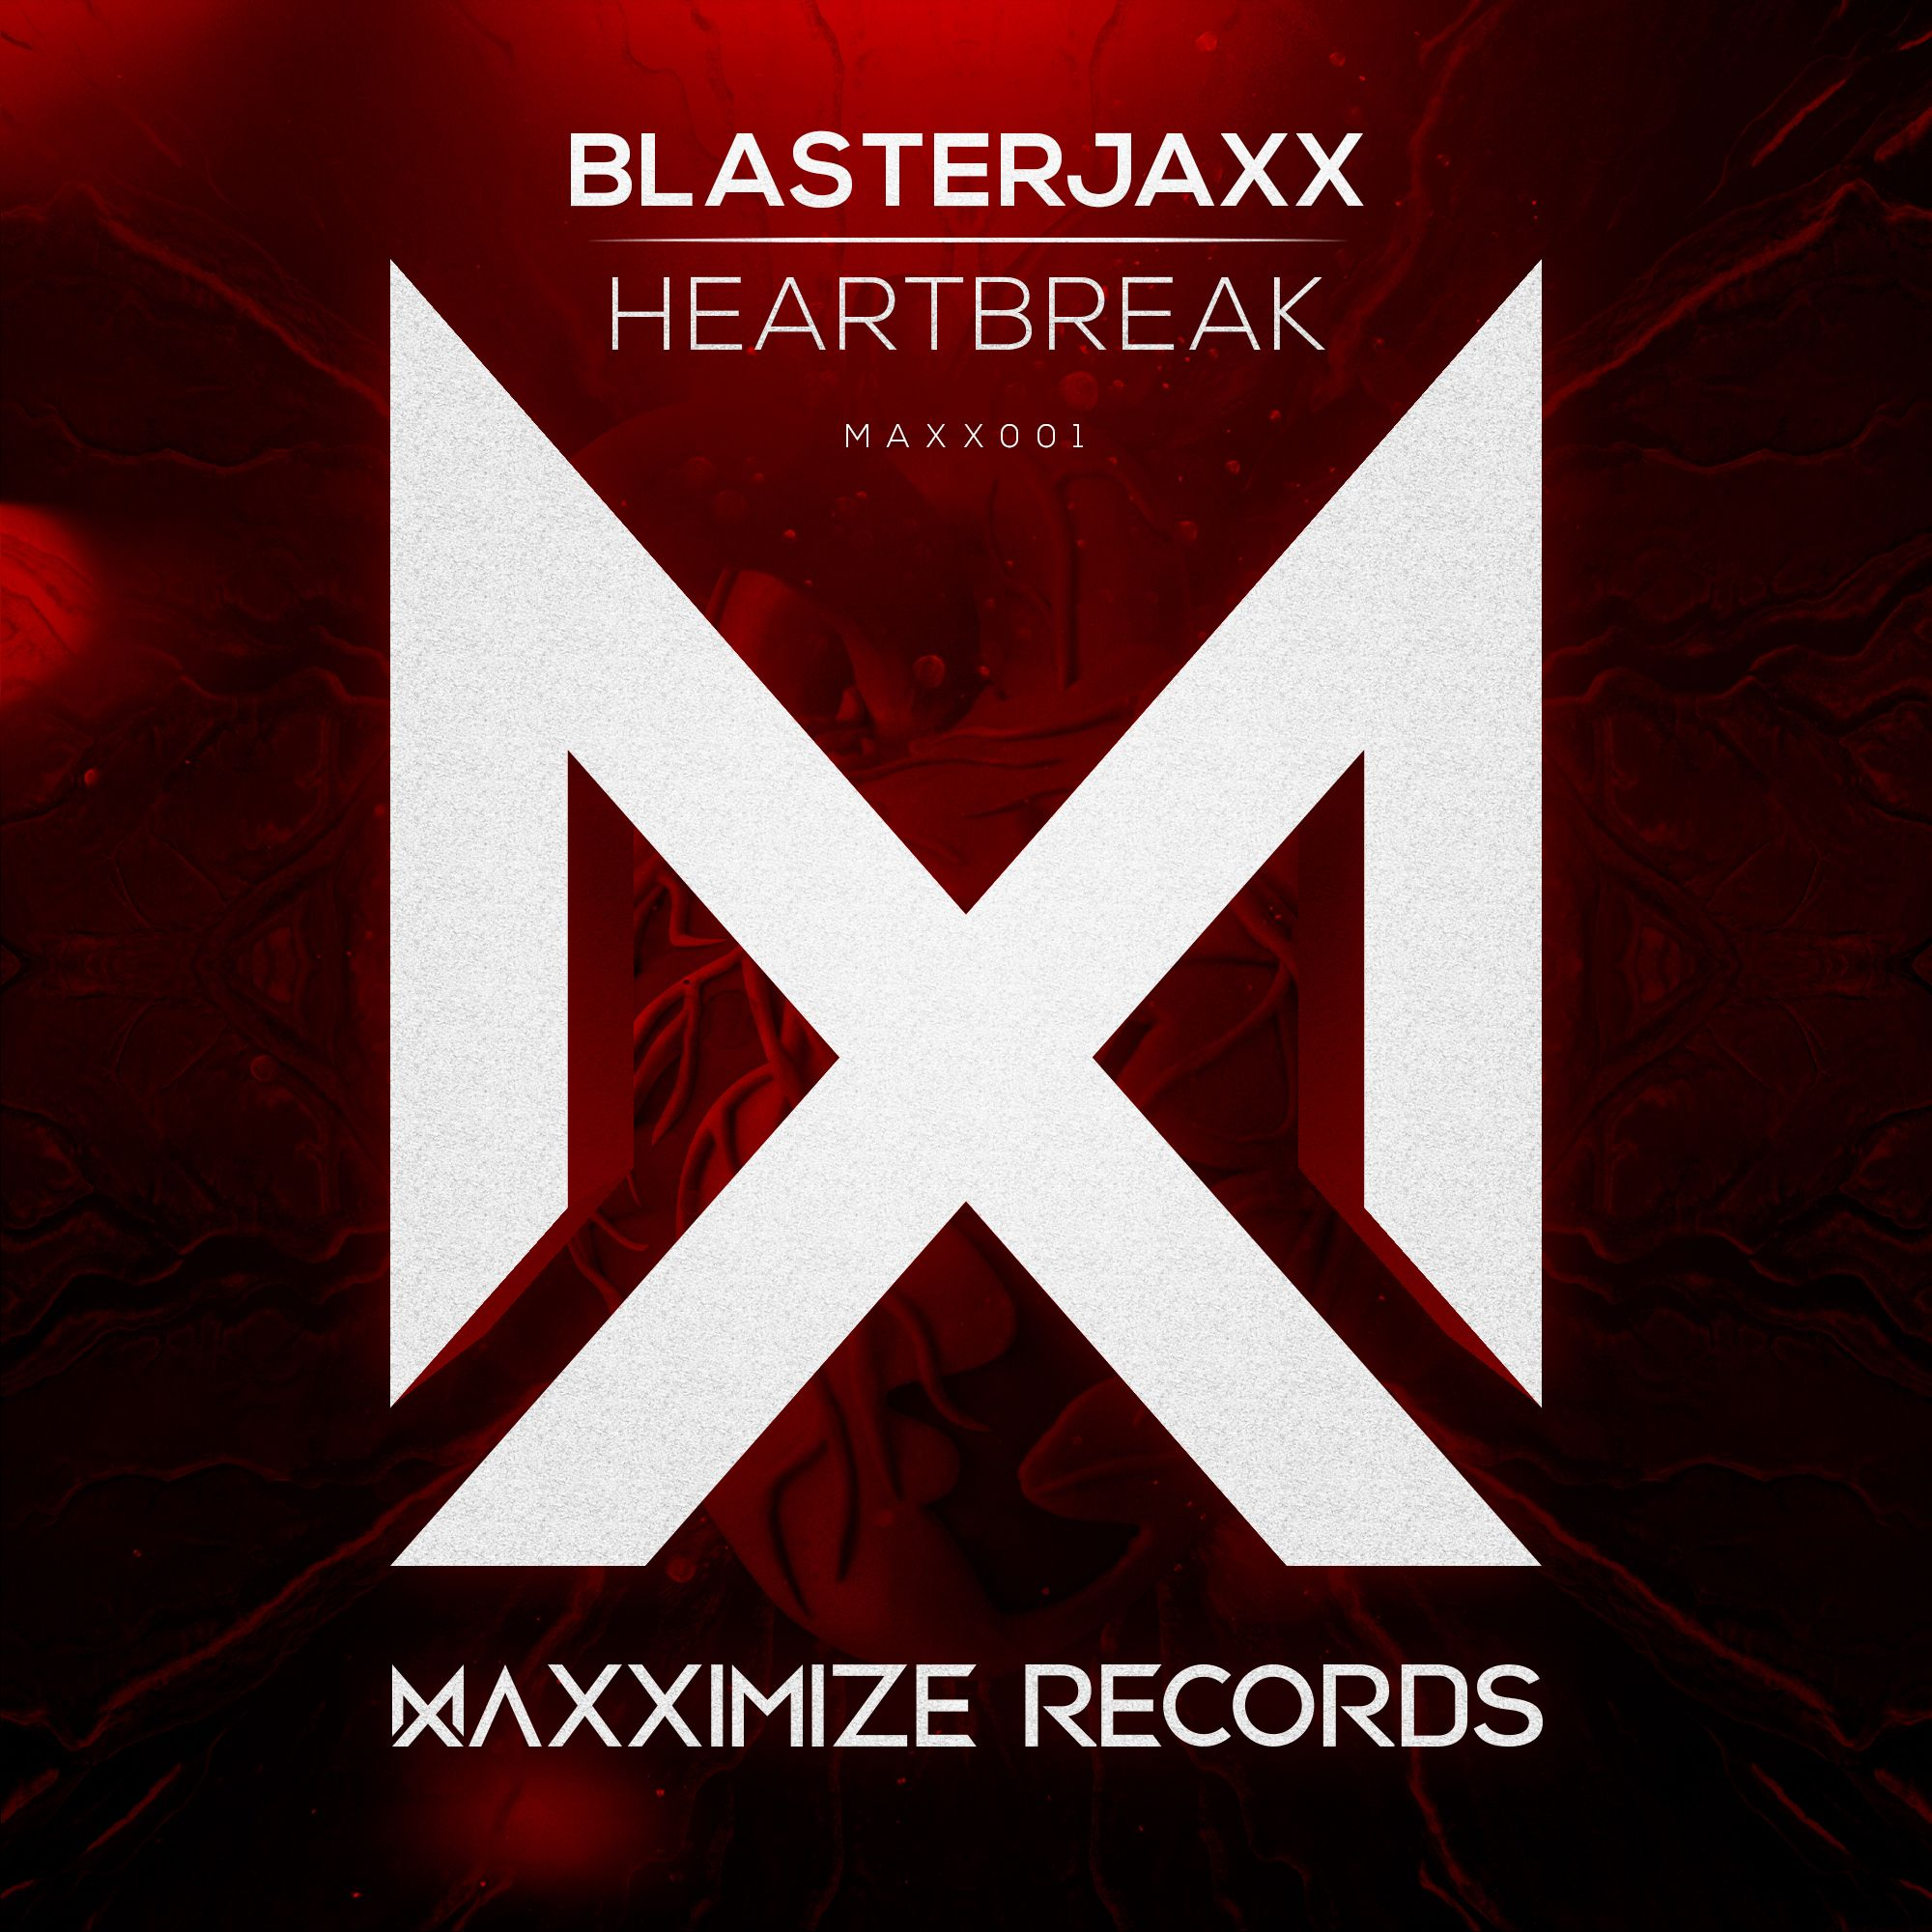 maxx001_blasterjaxx_heartbreak_cover_hr3.jpg